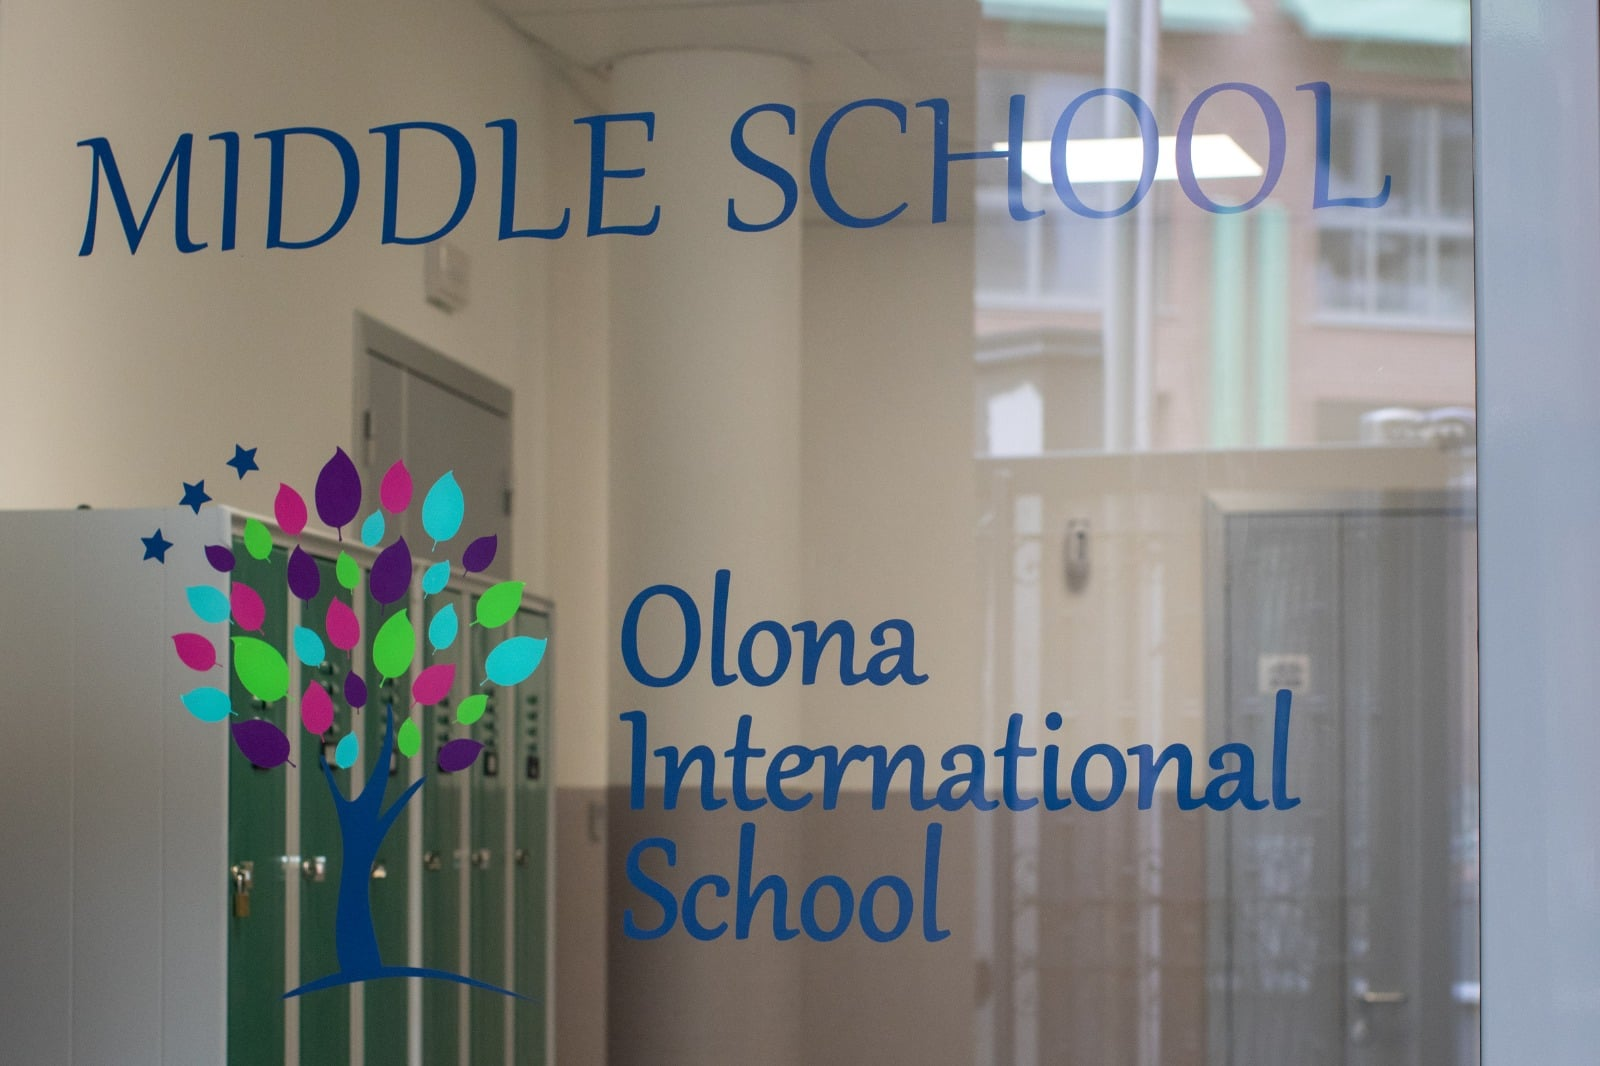 Olona International School: l'offerta formativa d'eccellenza in provincia di Varese!